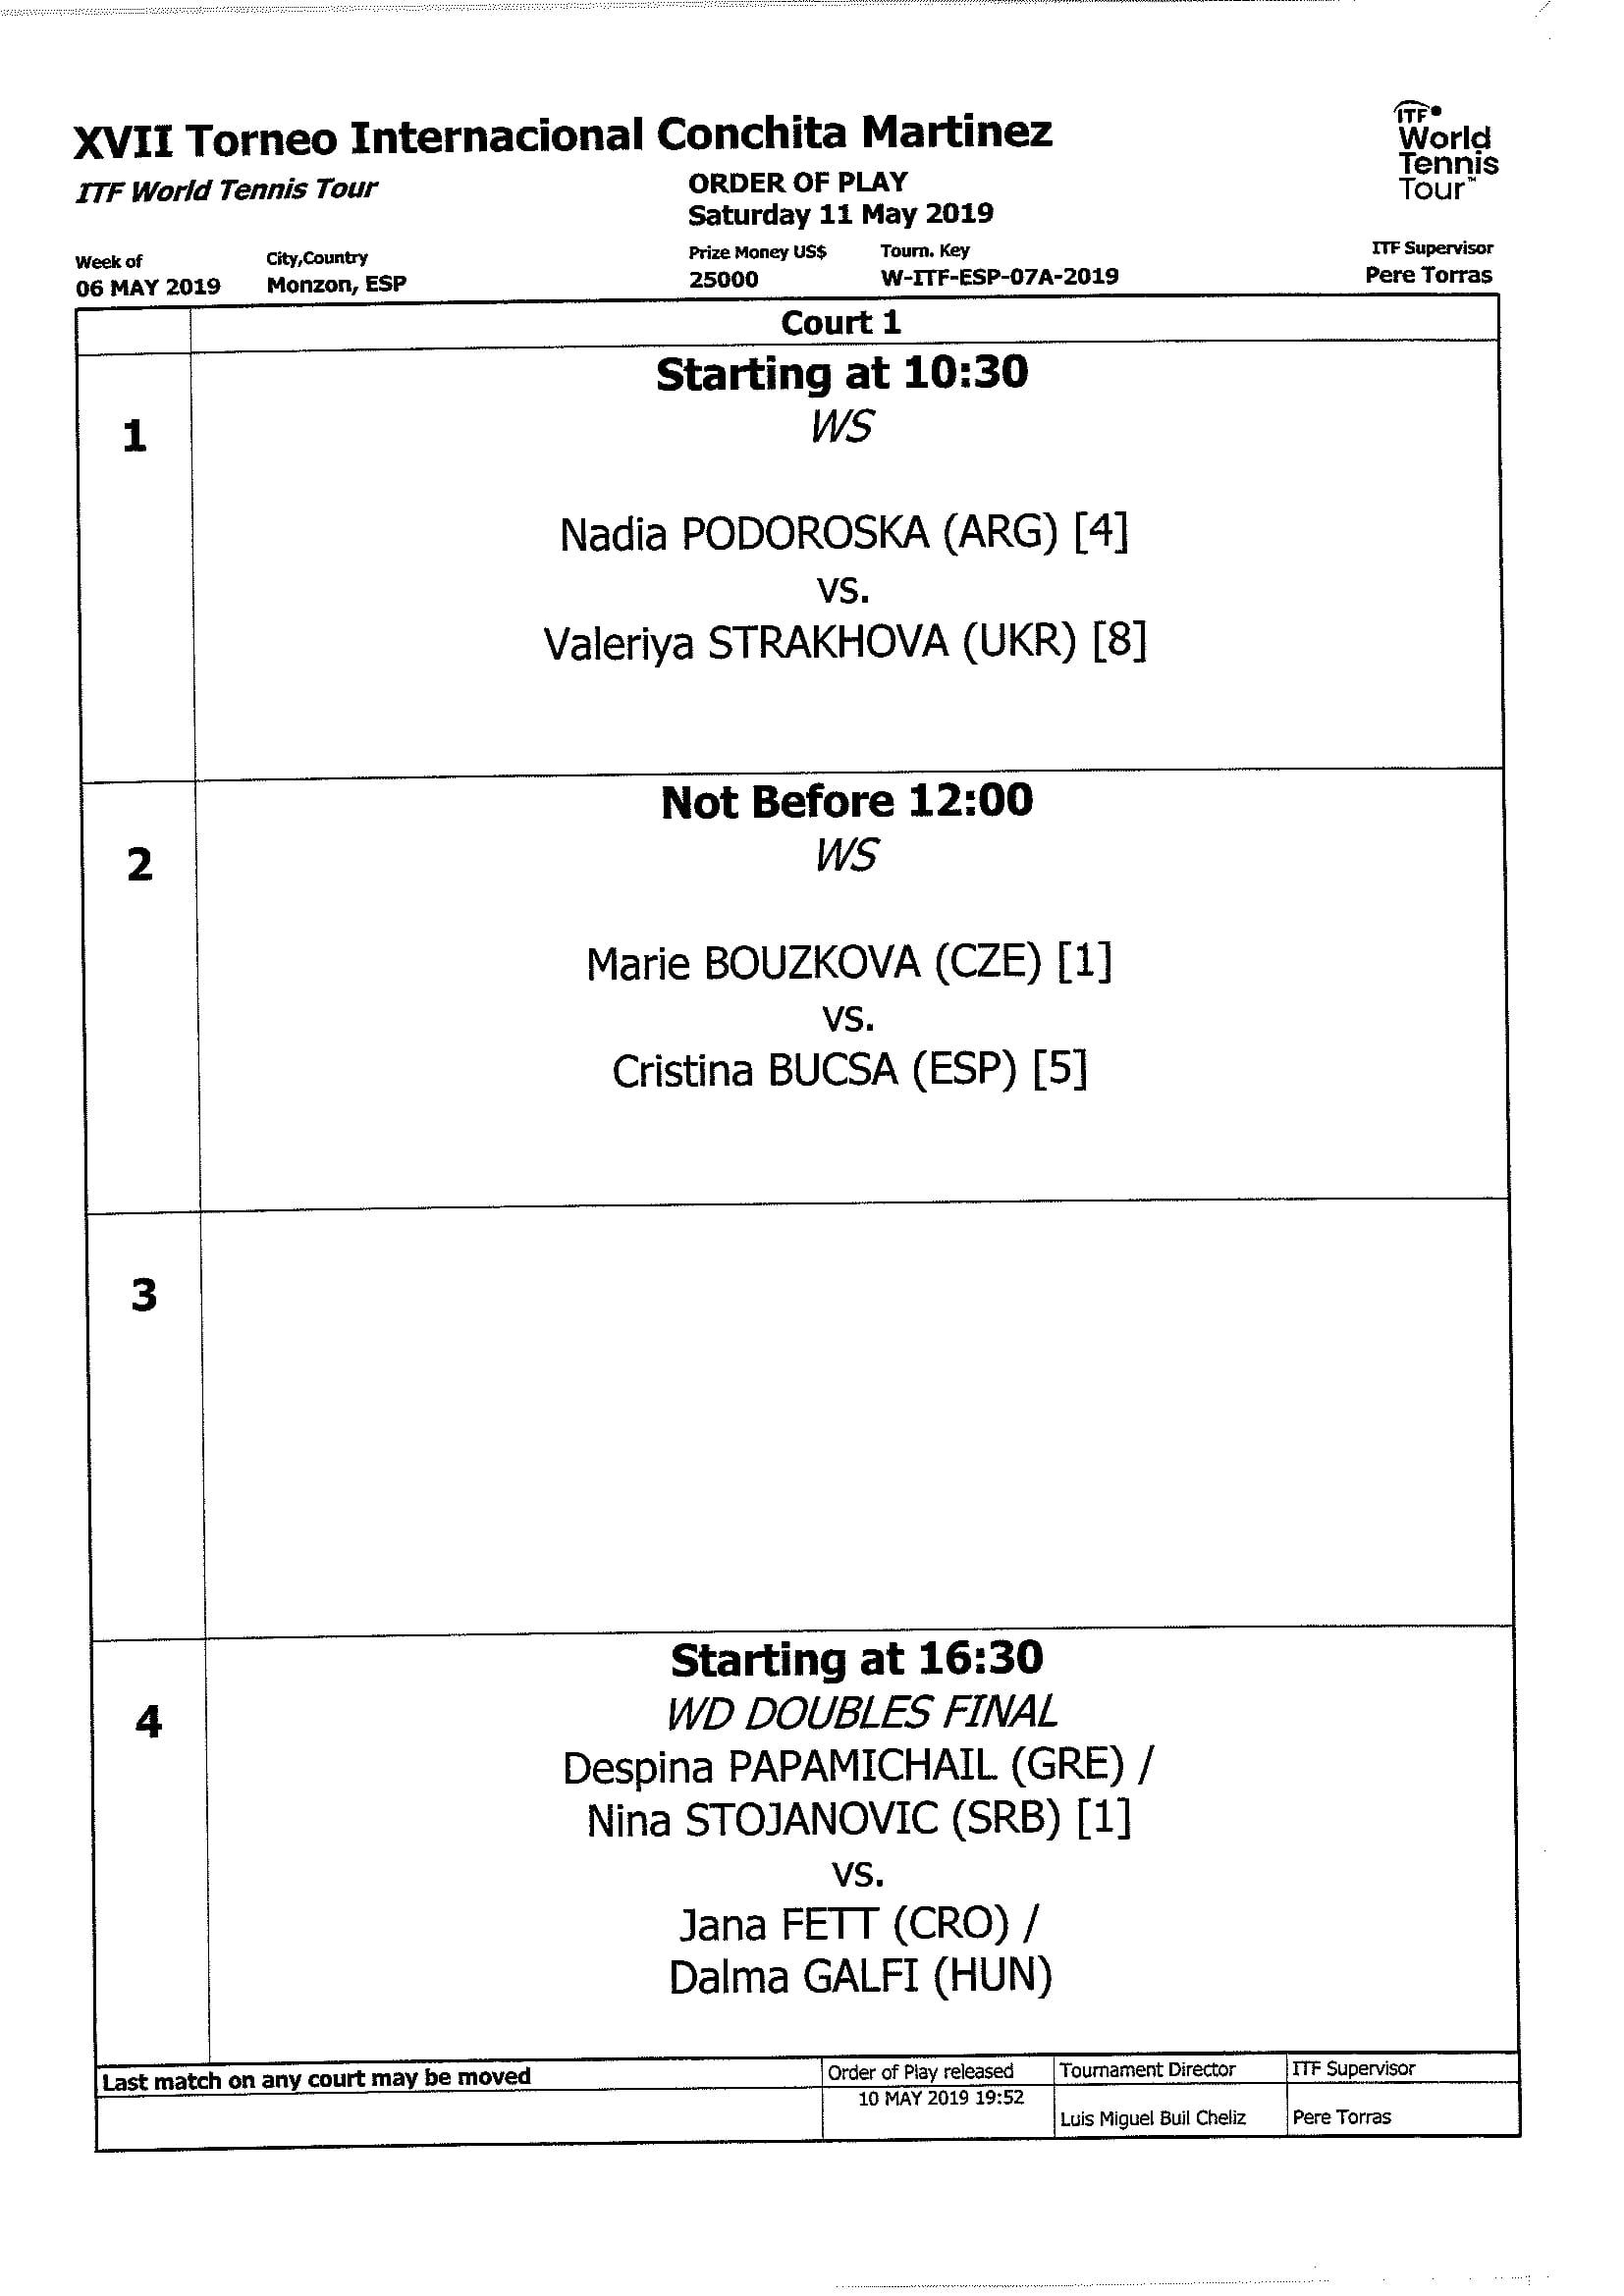 Programa torneo Conchita Martínez XVII (11-05-2019)